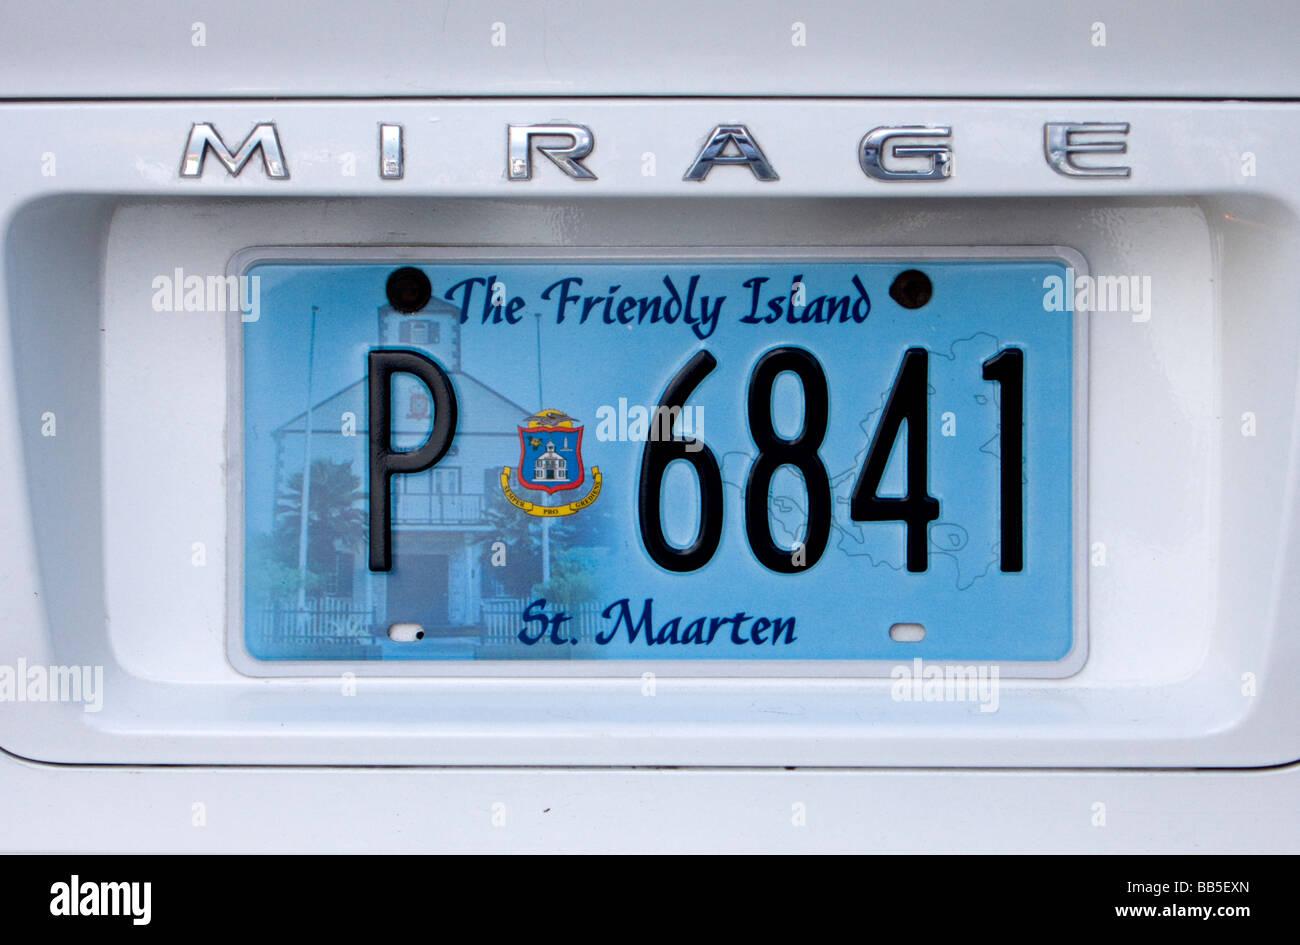 Vehicle Number Plate Stockfotos & Vehicle Number Plate Bilder - Alamy